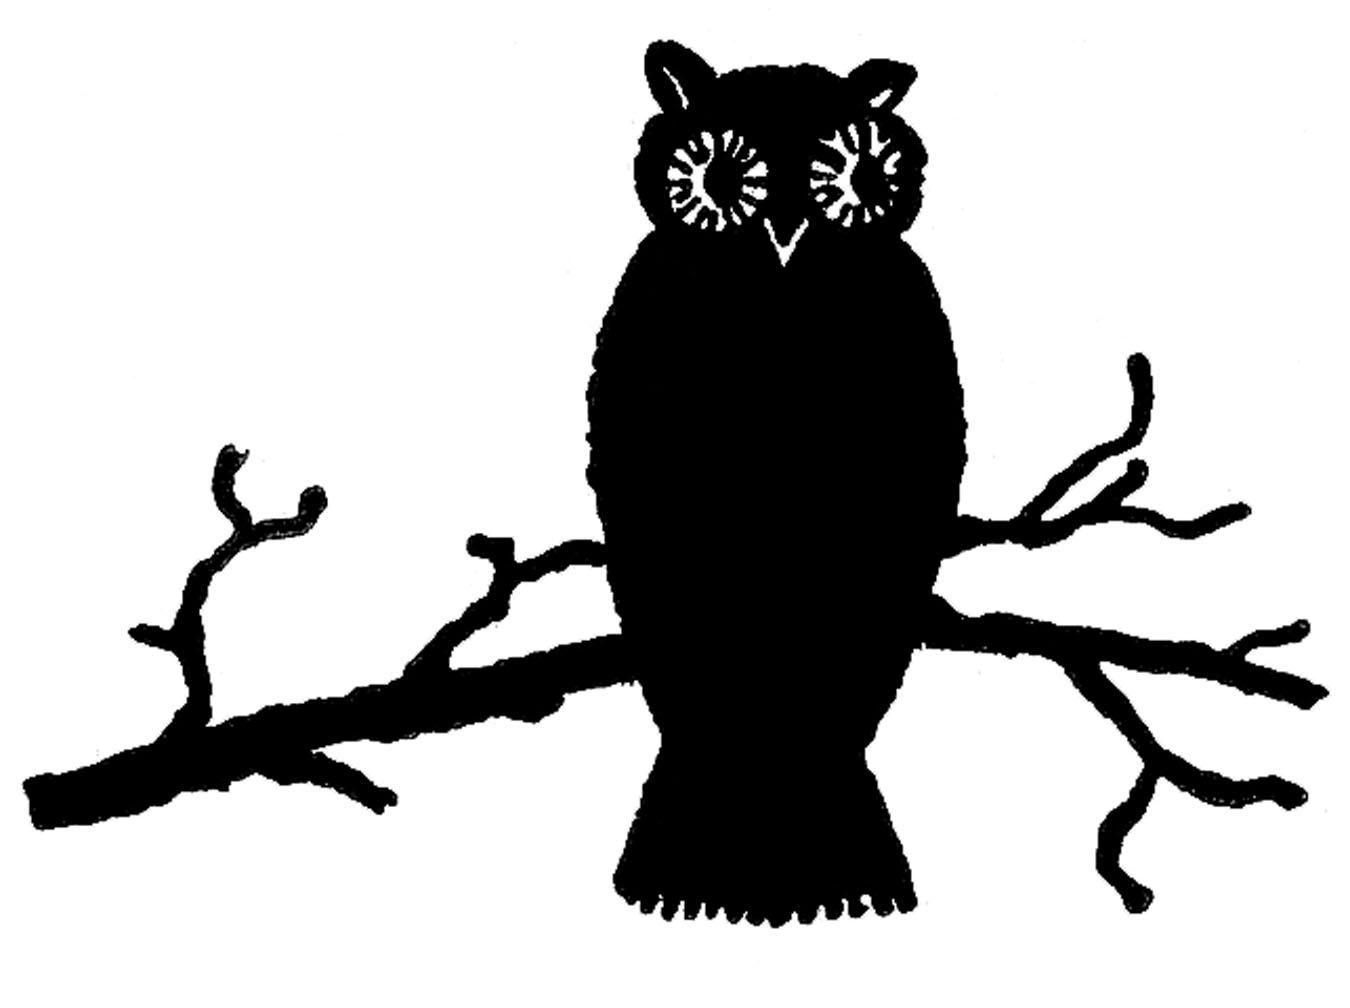 Vintage Halloween Clip Art - Cute Owl Silhouette - The ...